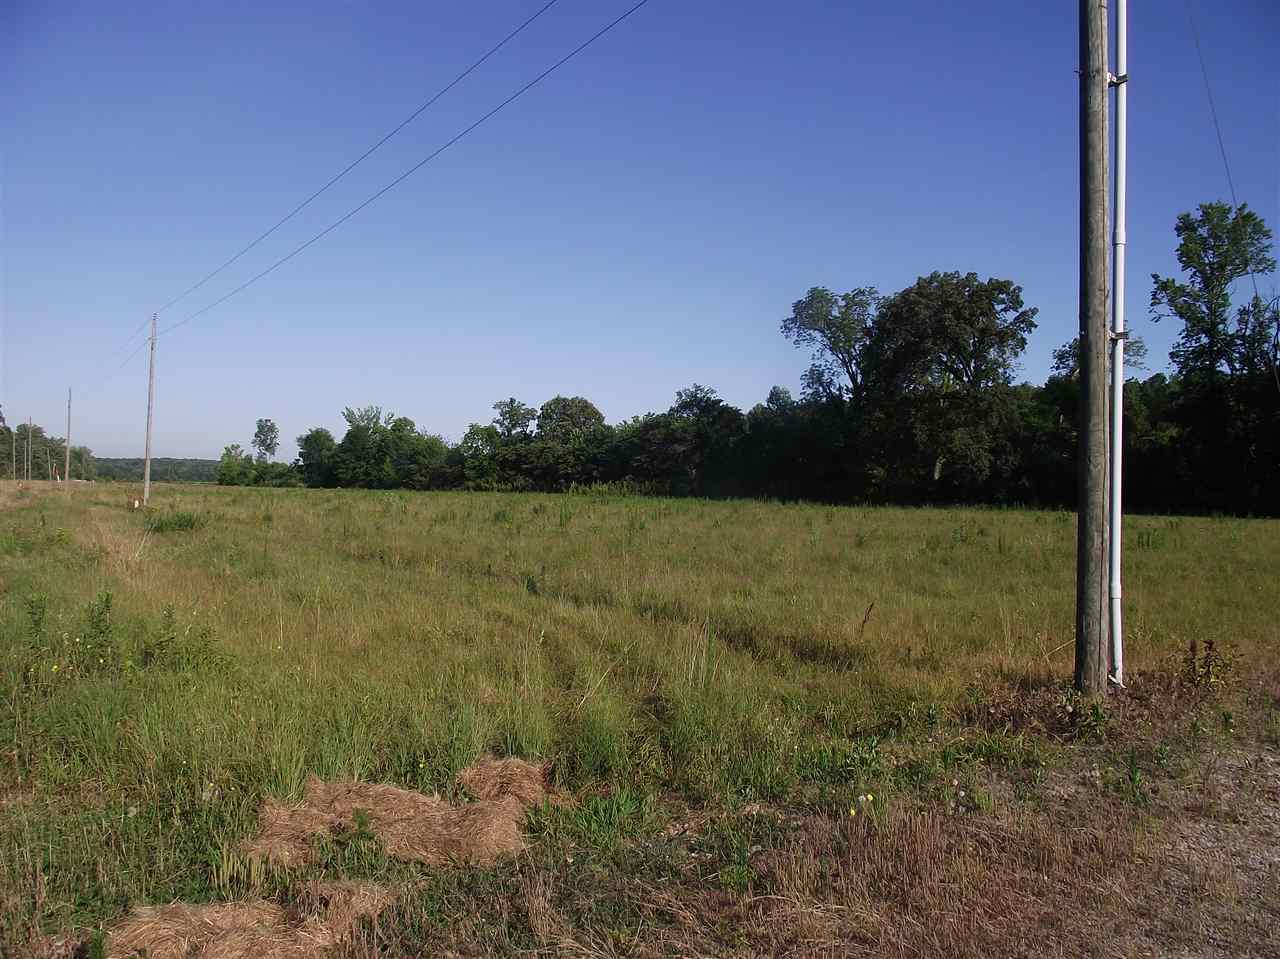 39 Charles Ward, Selmer, TN 38375